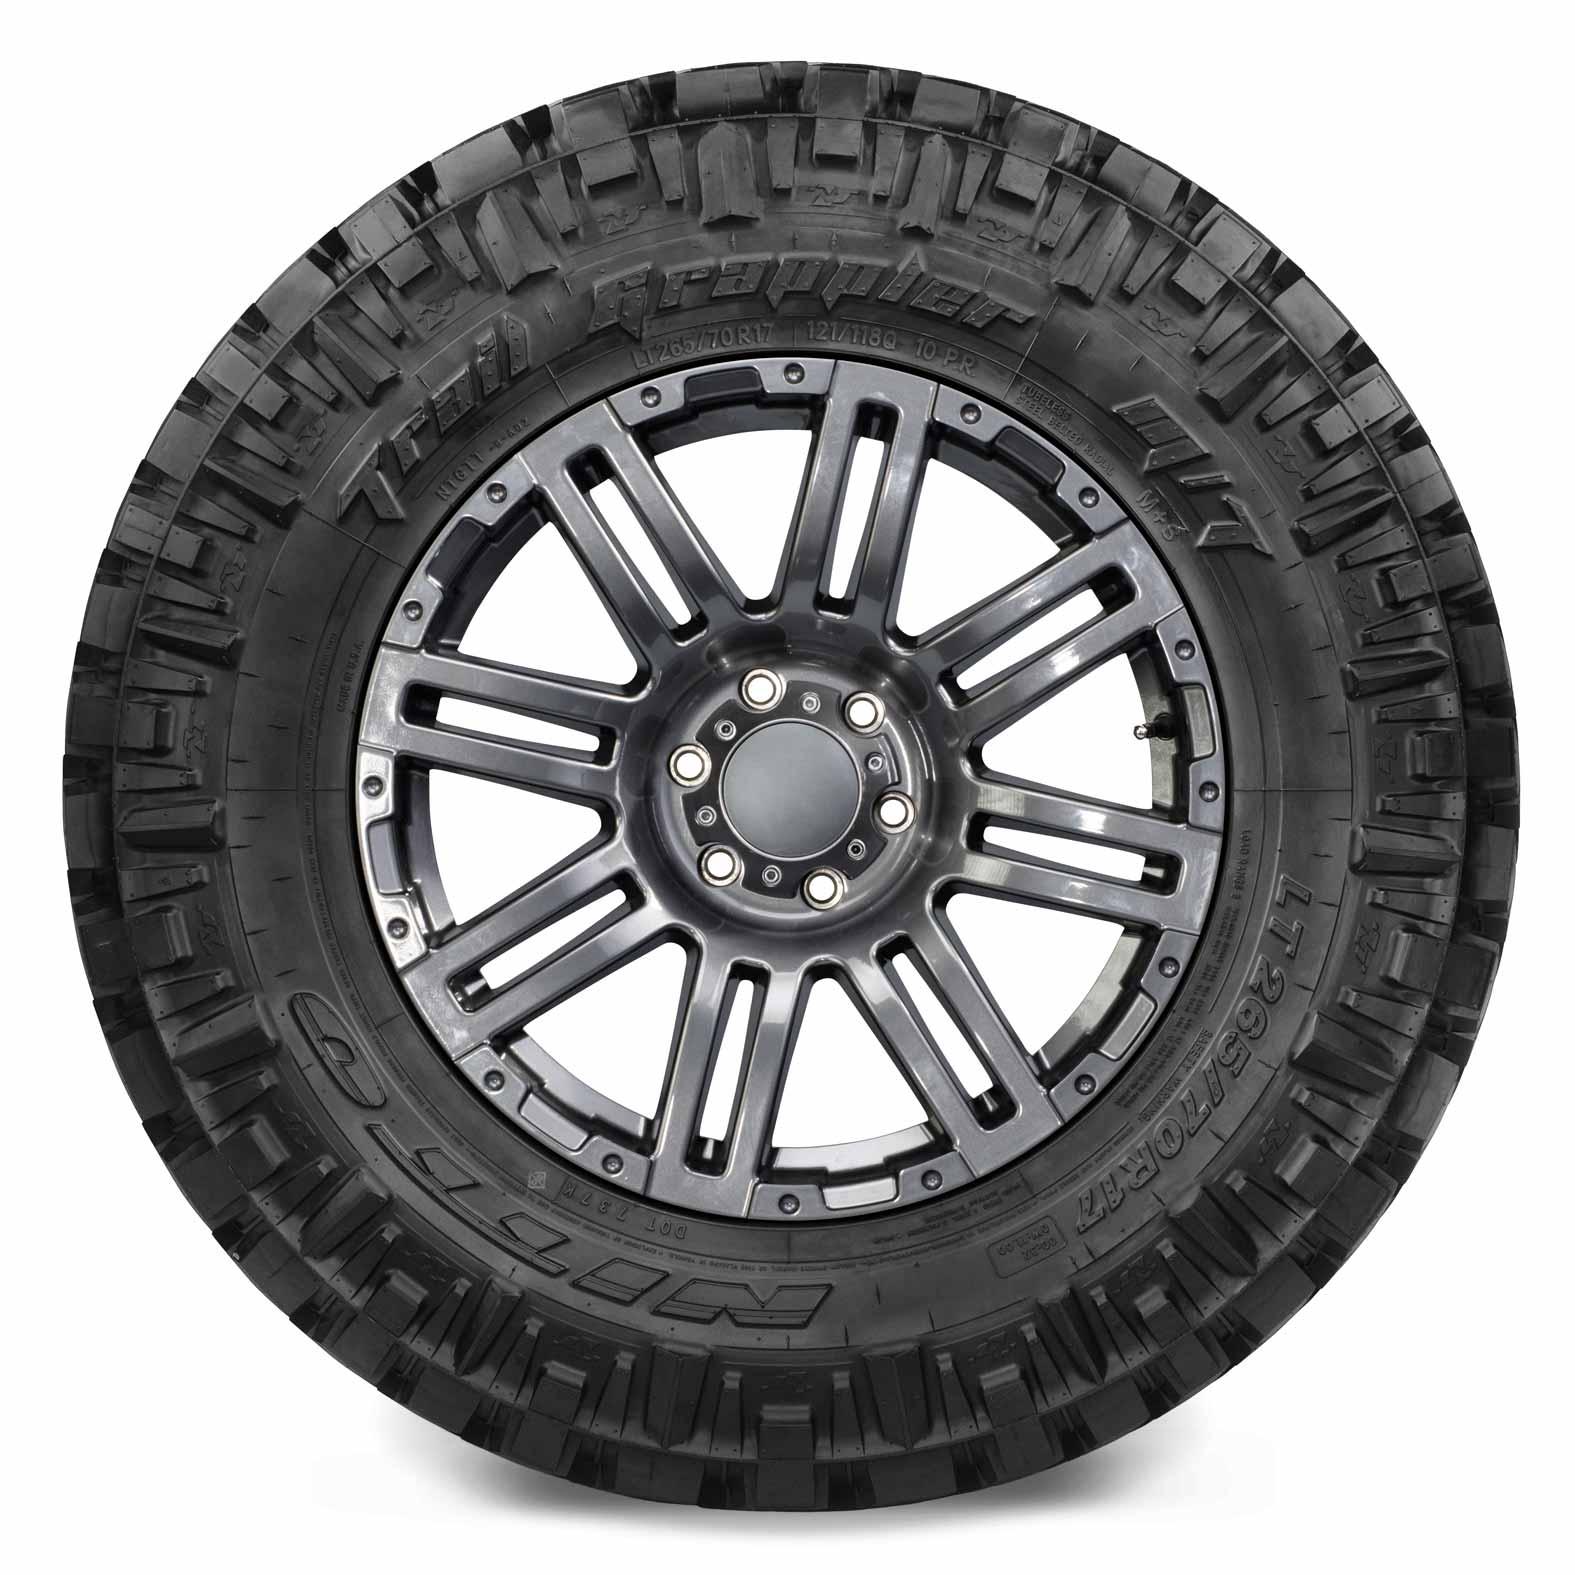 Nitto Terra Grappler Mt >> Nitto Trail Grappler M T Tires